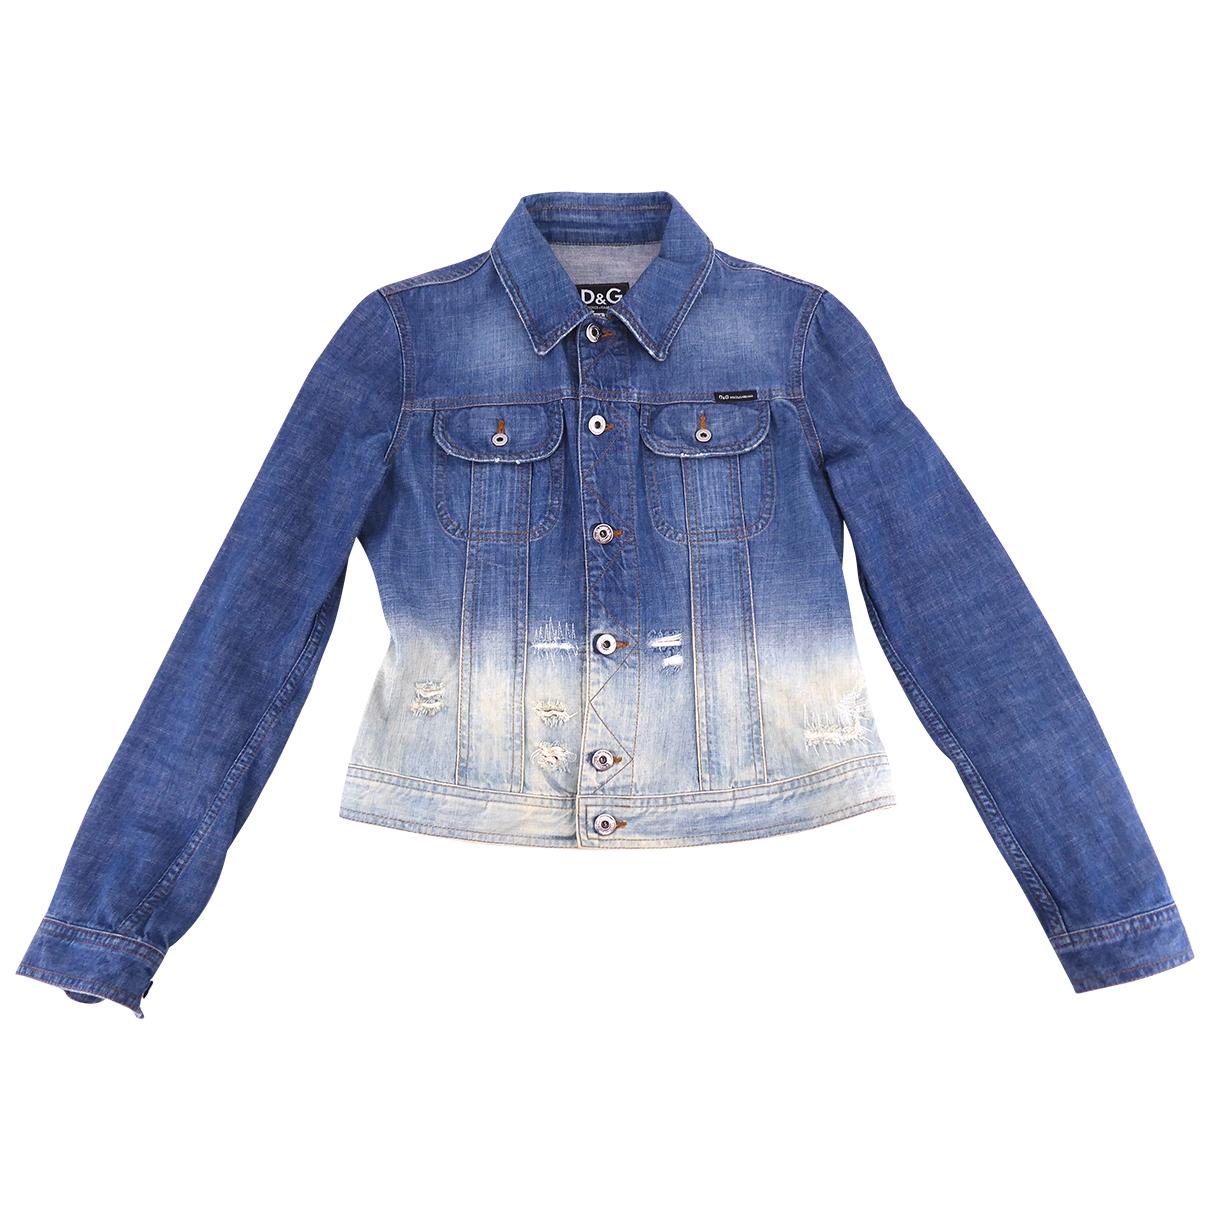 D&g \N Blue Denim - Jeans jacket for Women M International